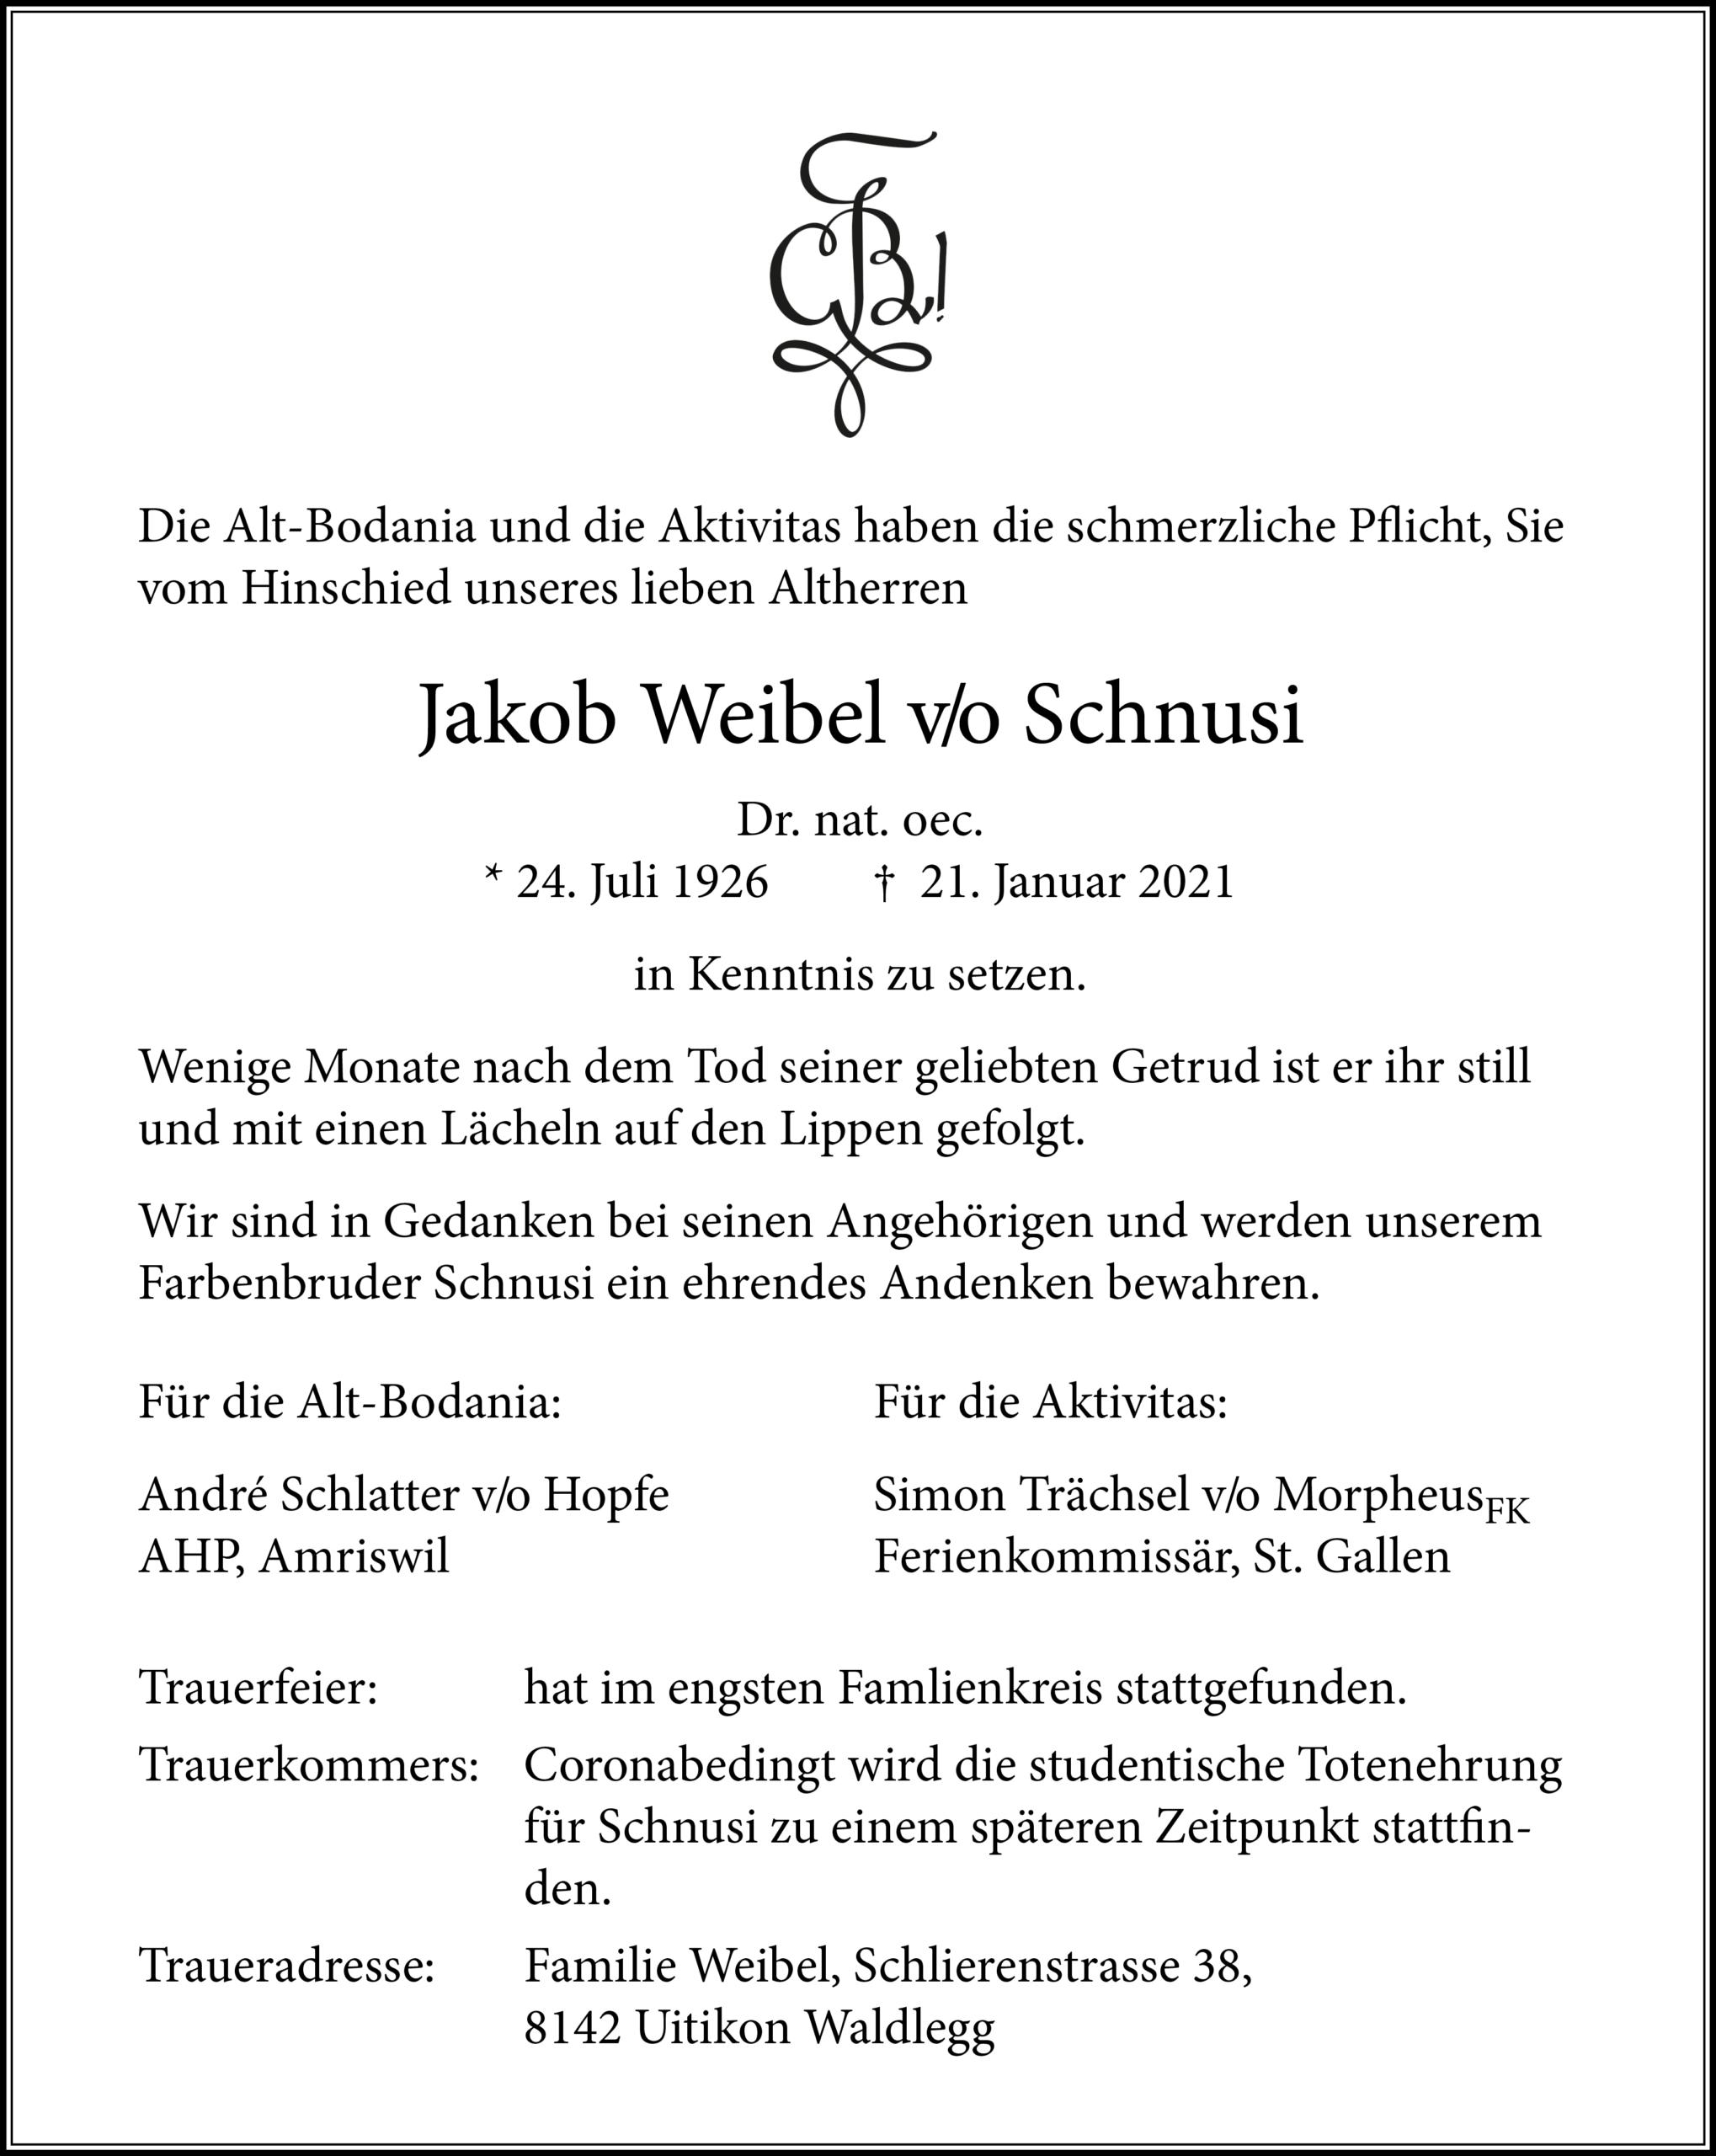 Jakob Weibel v/o Schnusi †